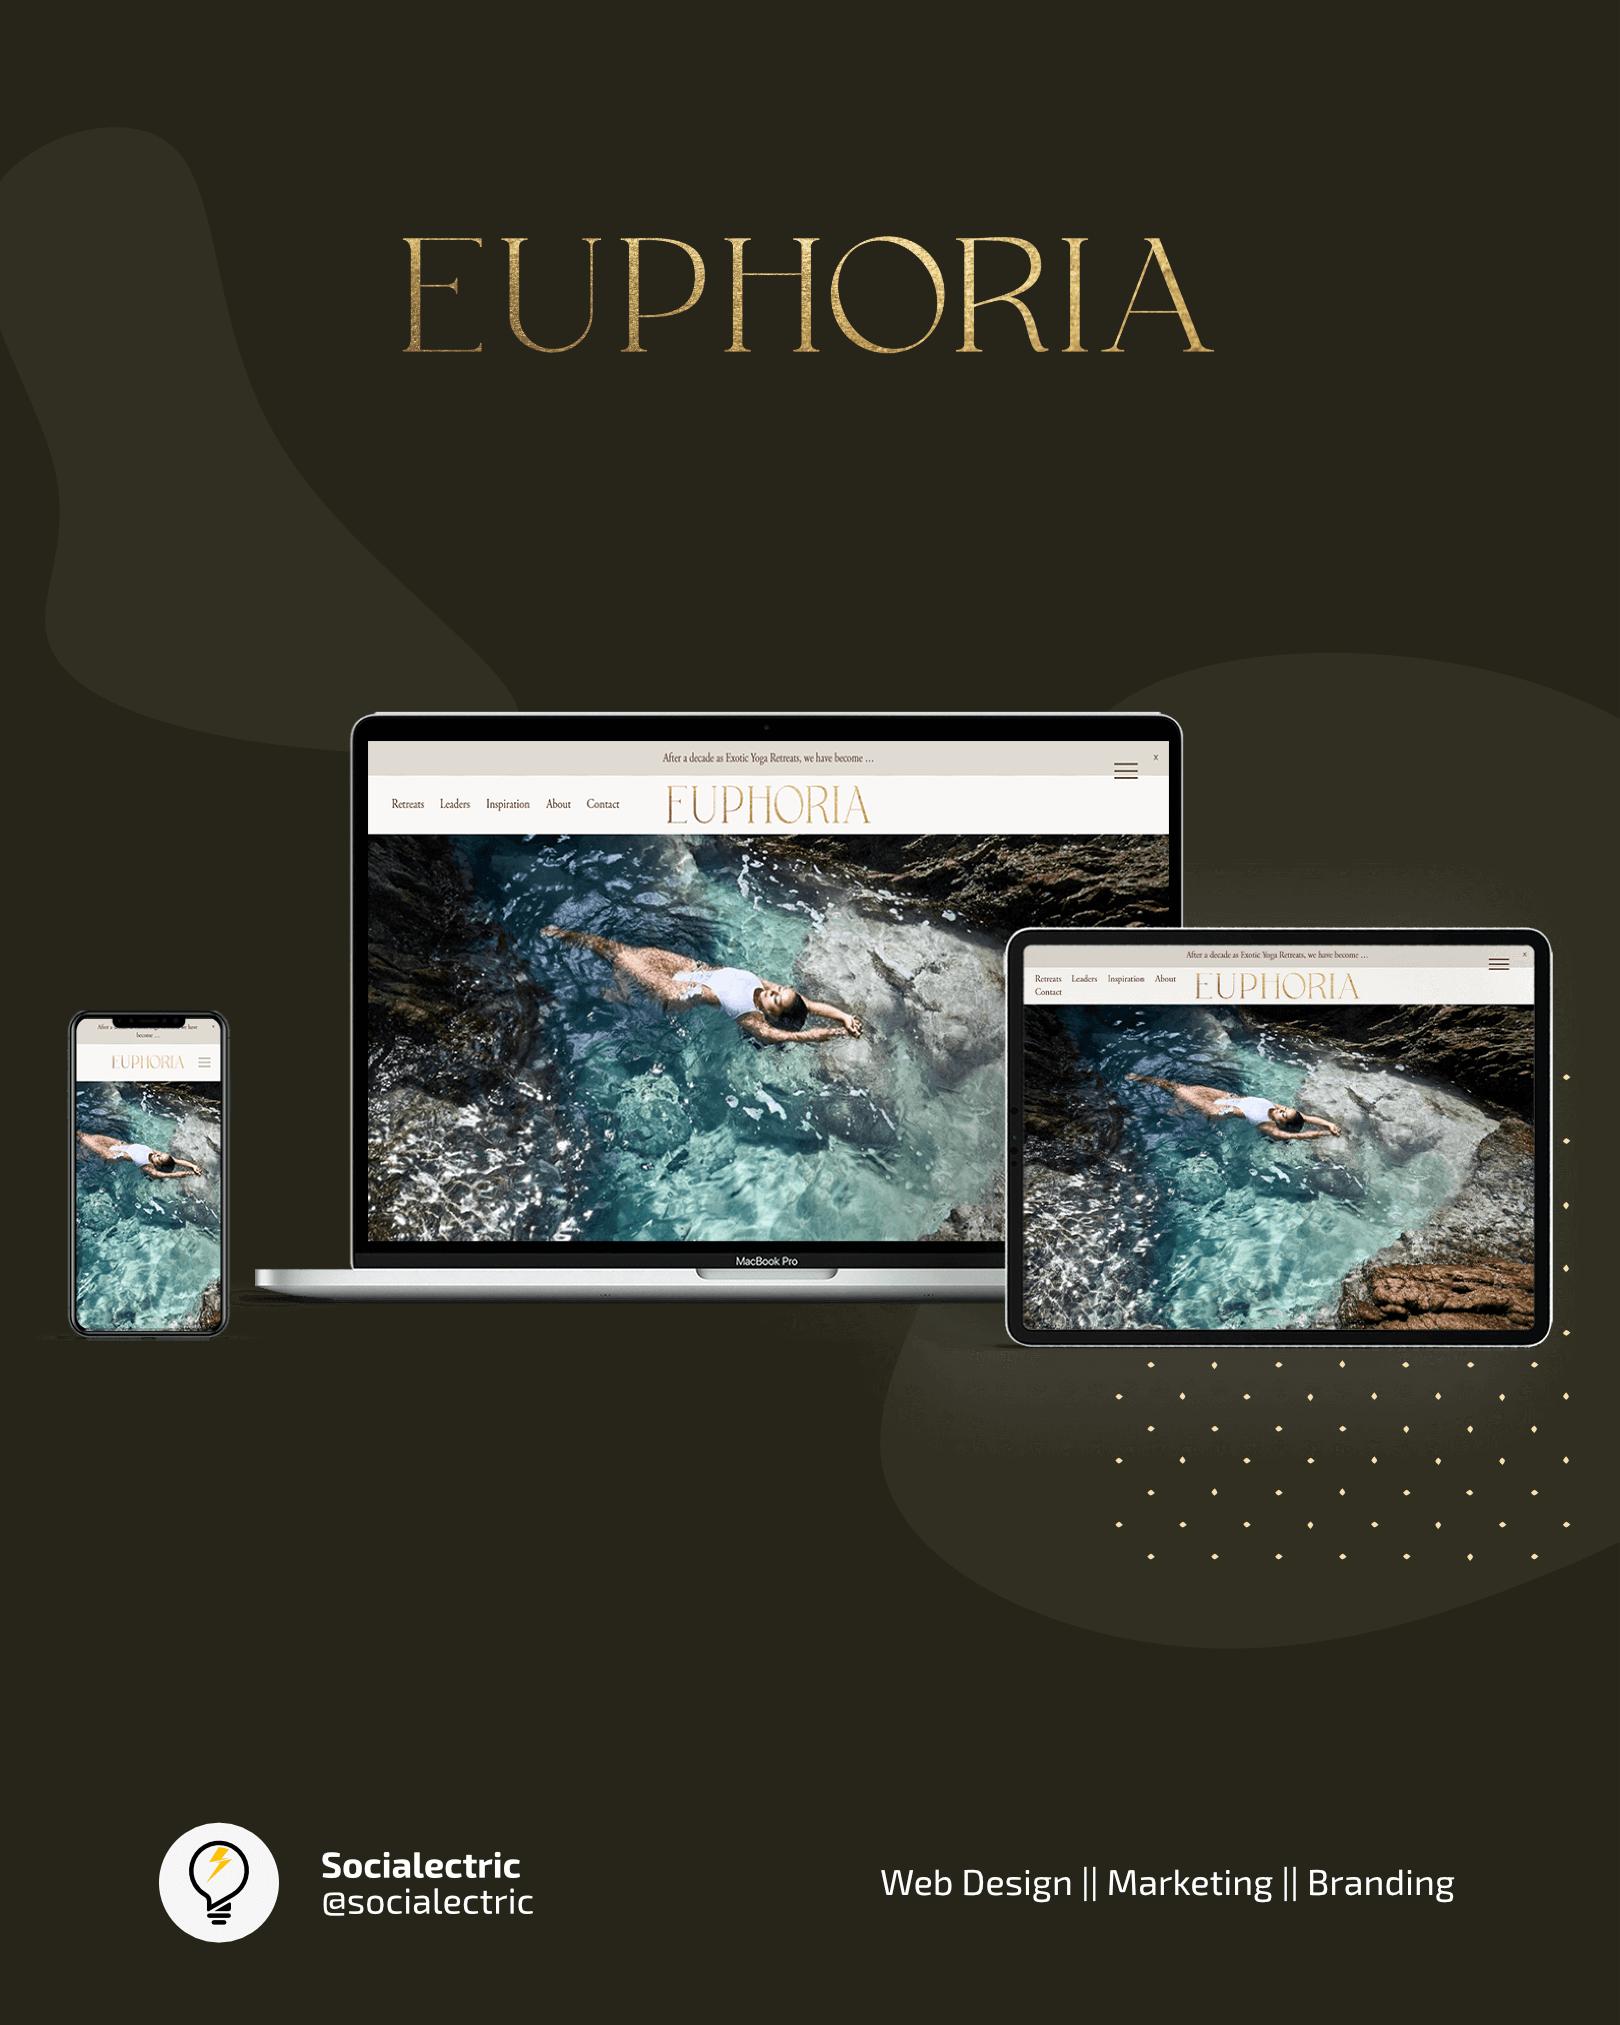 Euphoria Retreats